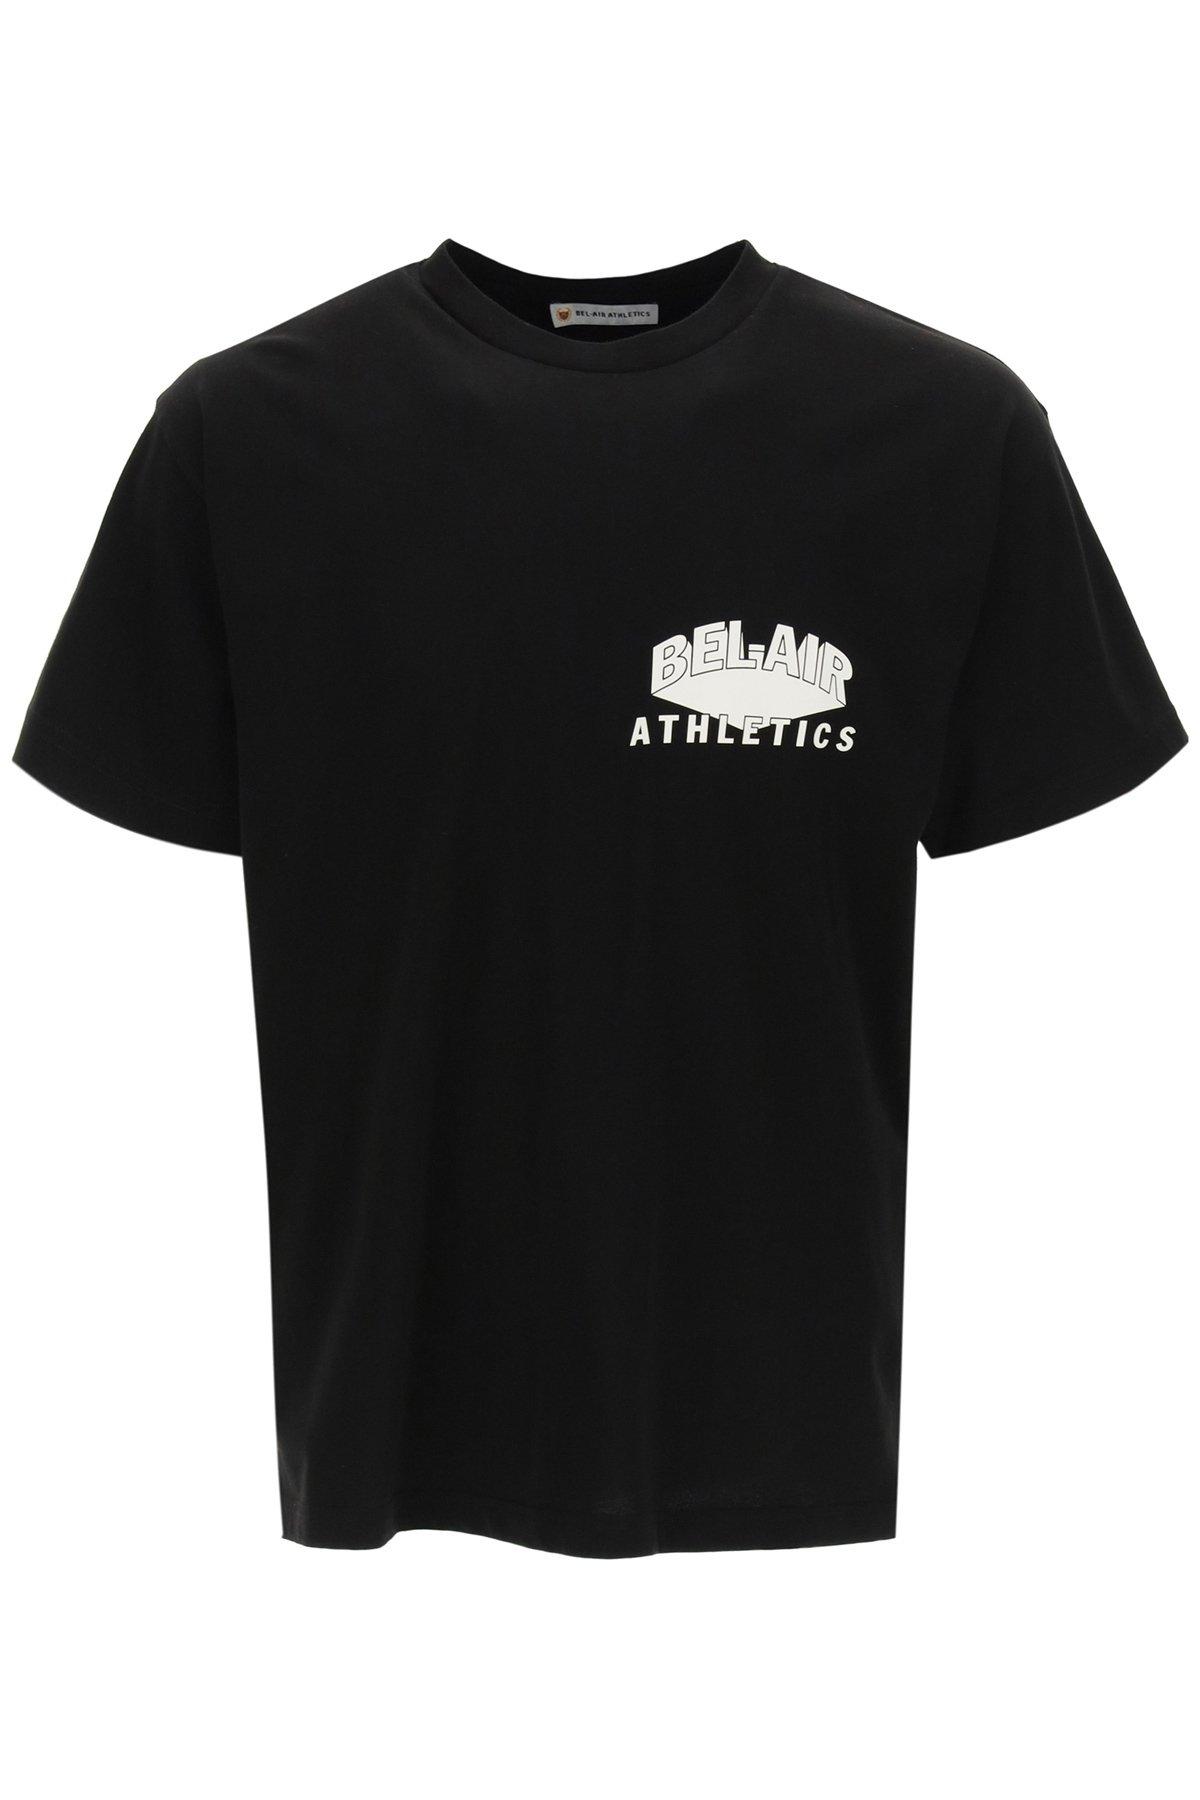 Bel-air athletics t-shirt arch logo